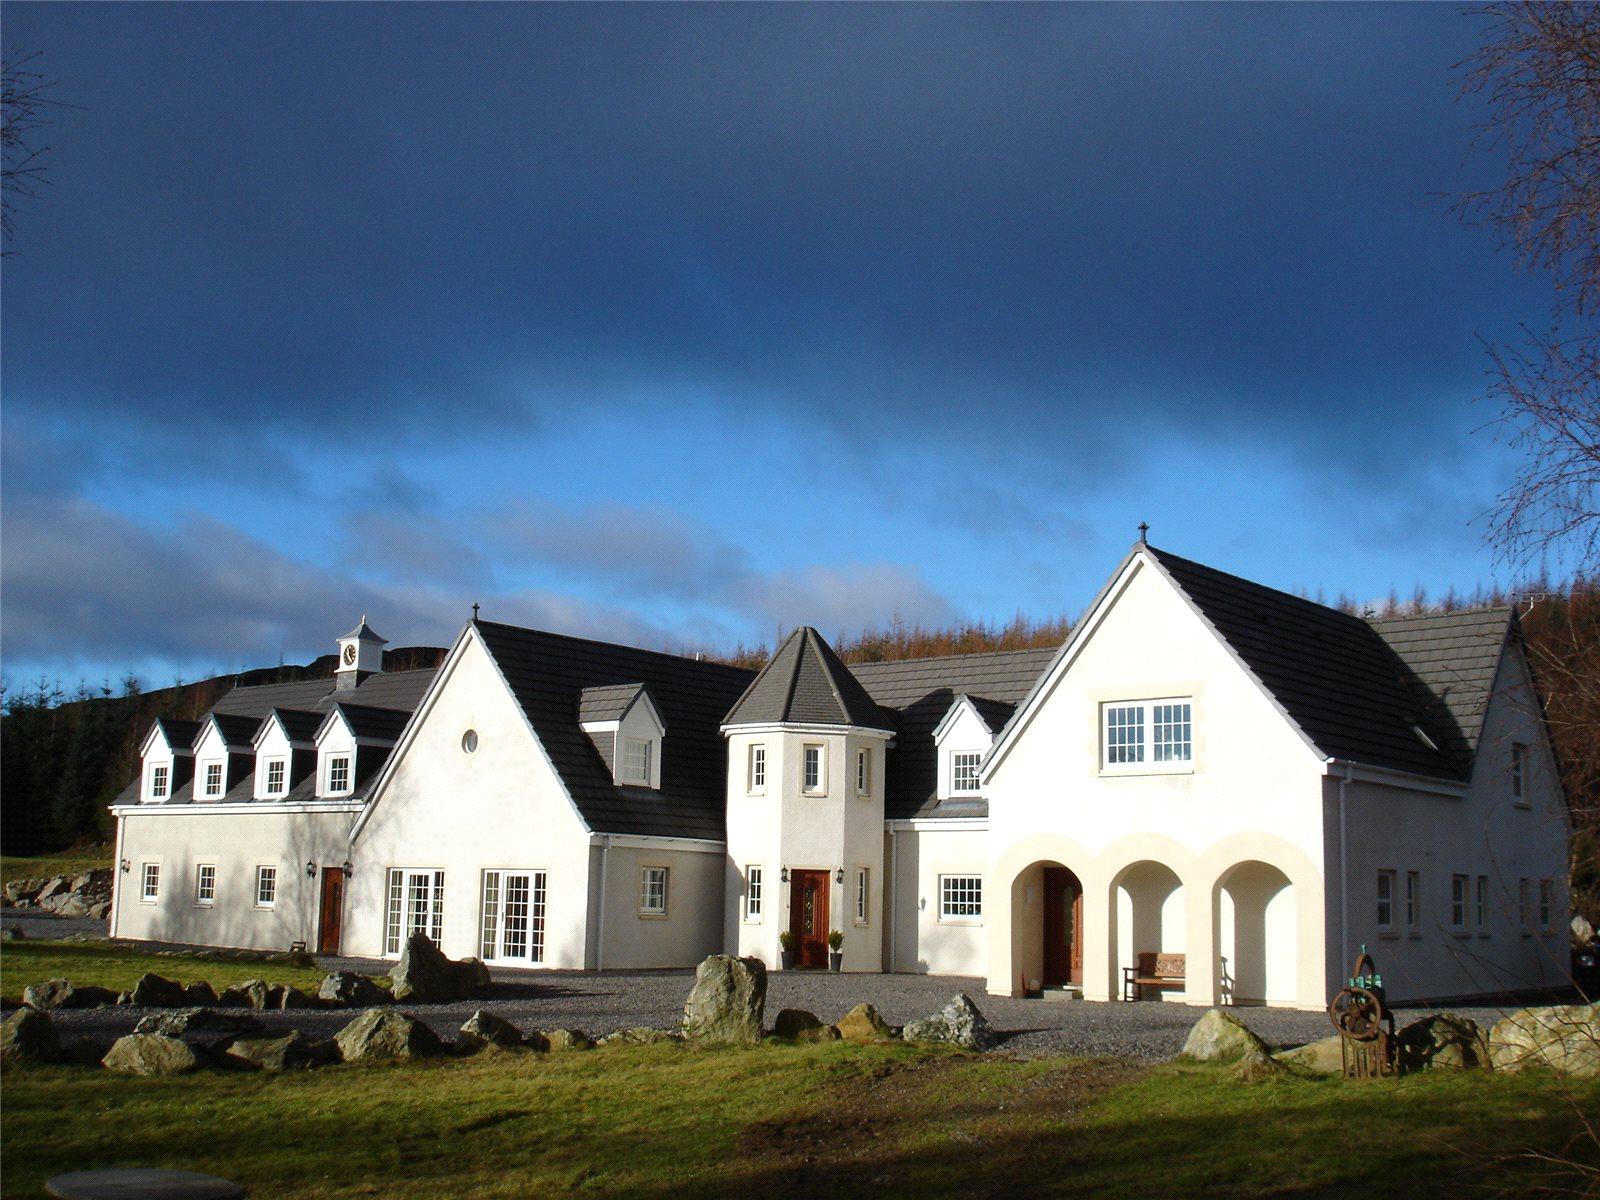 Scotland Luxury Real Estate for Sale Christie39s